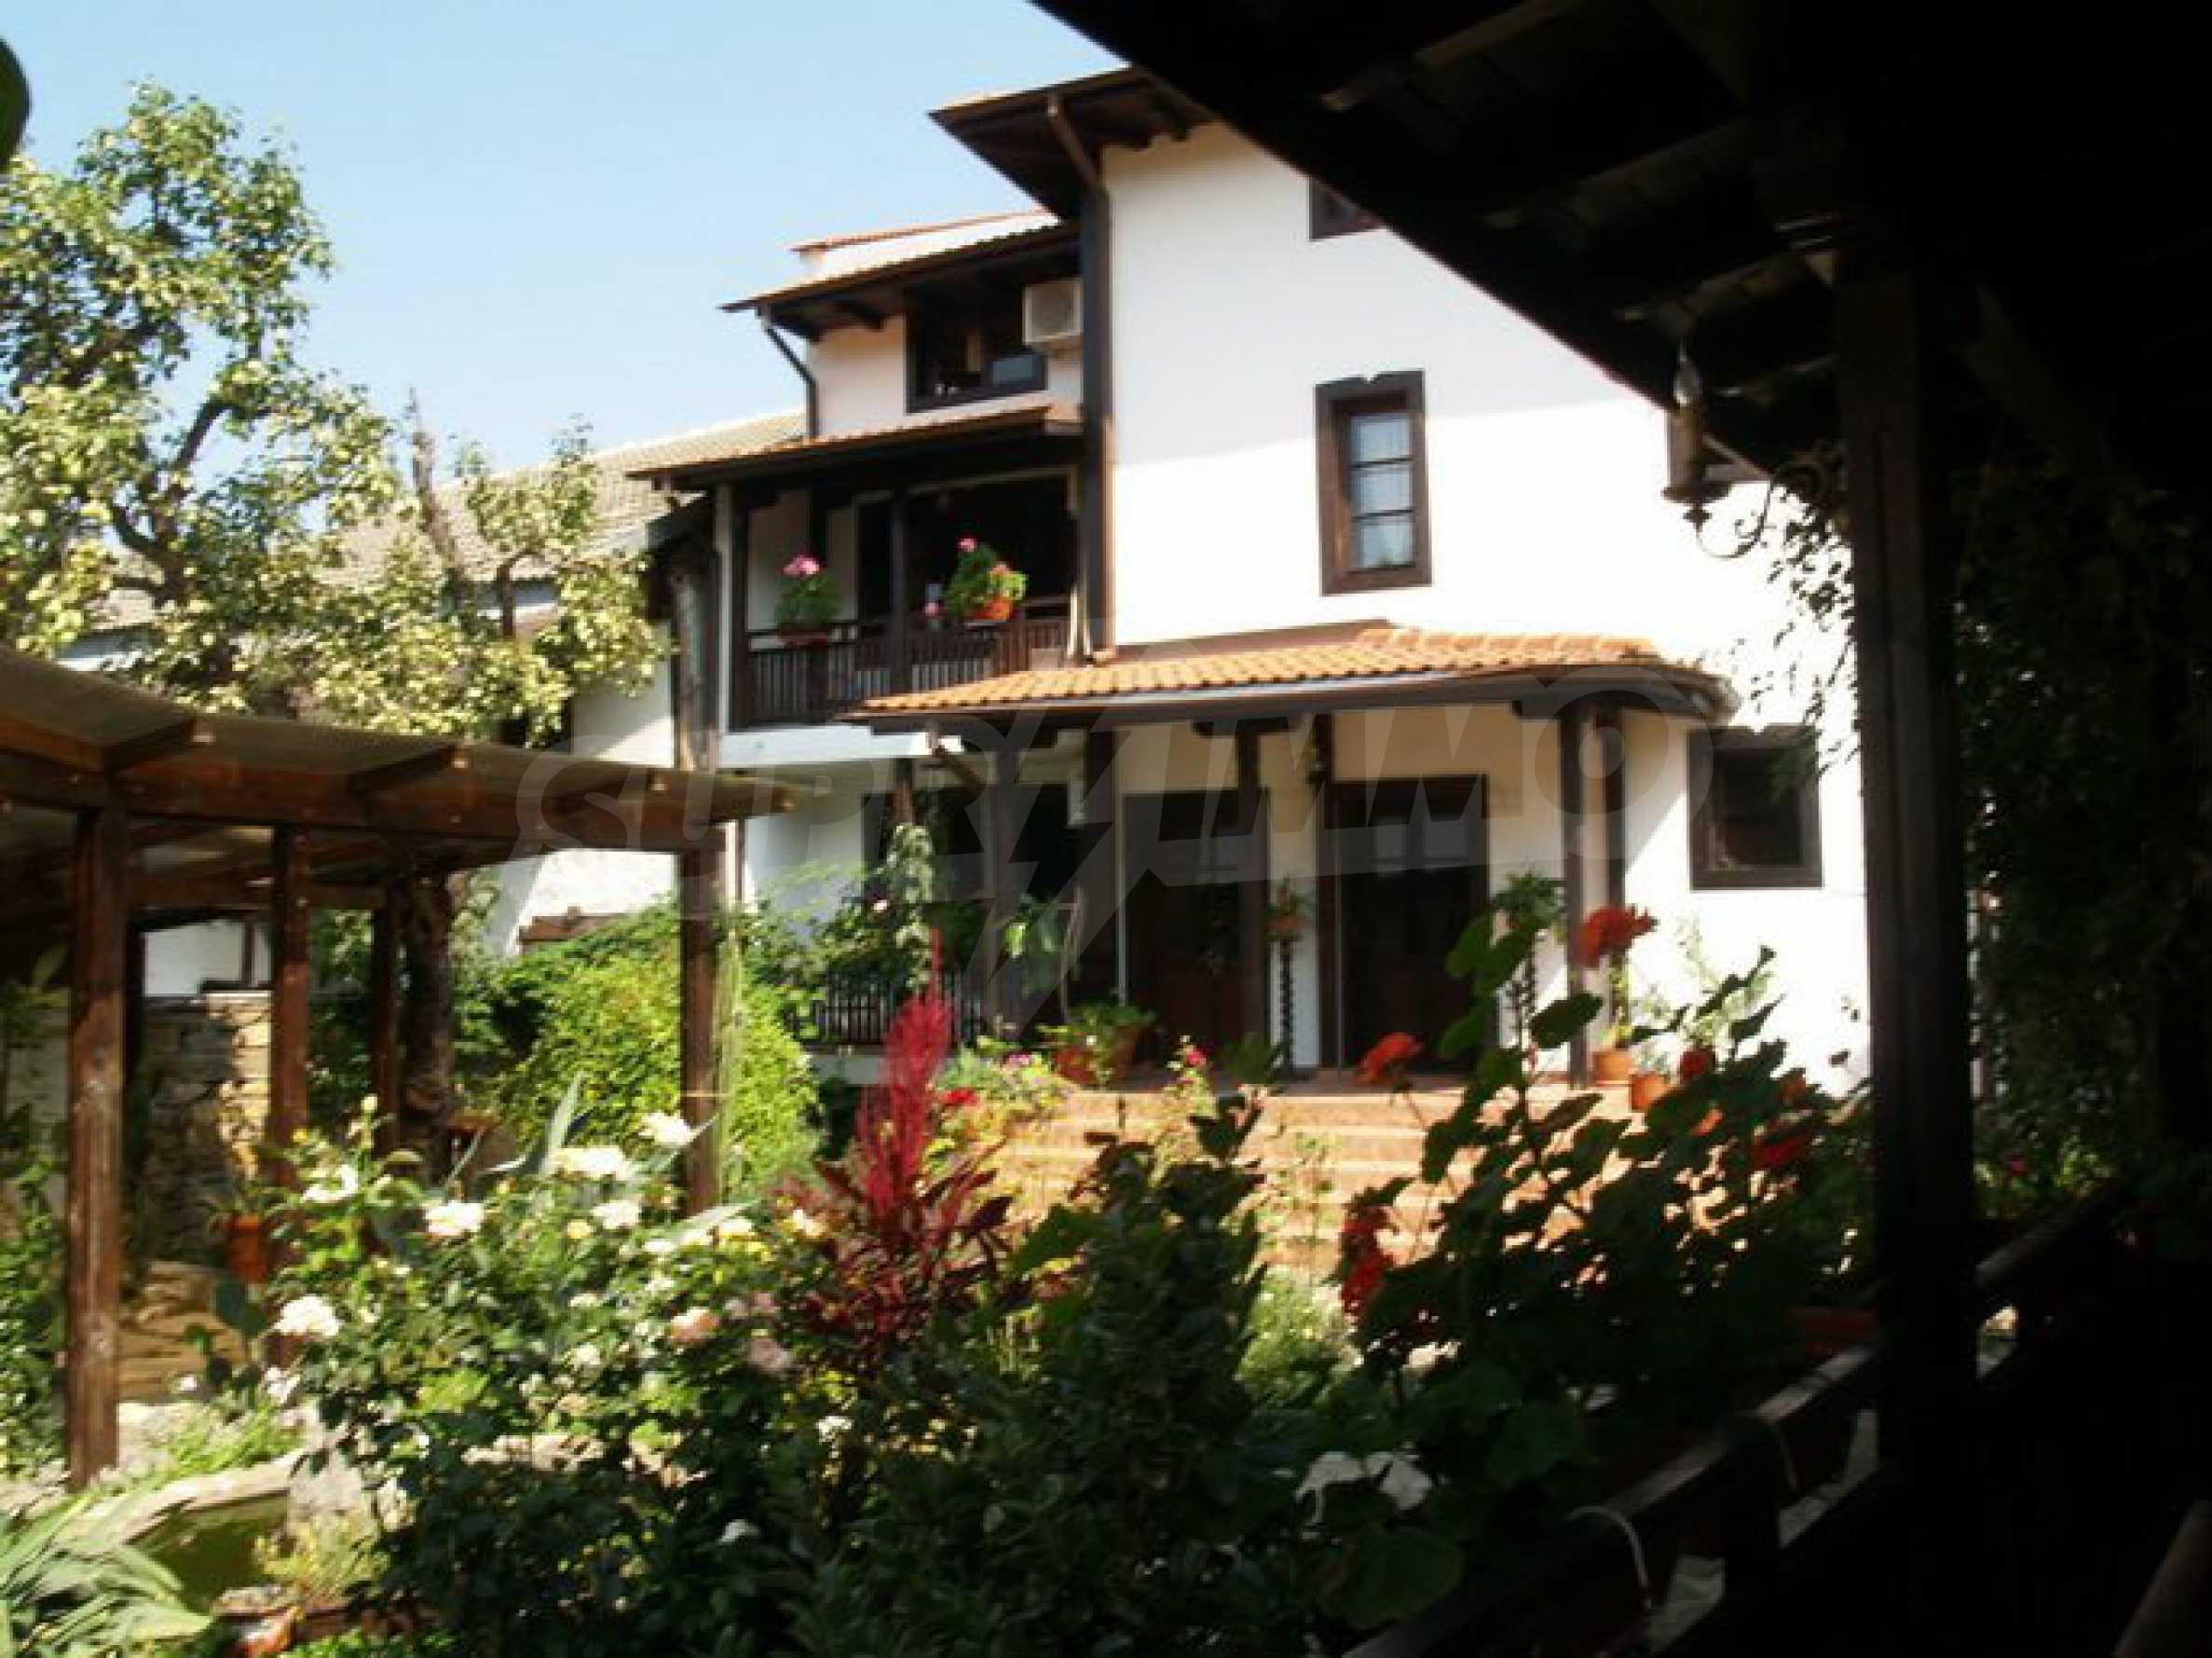 Hotelanlage mit Restaurant am Ufer des Flusses Osam in Lovech 11